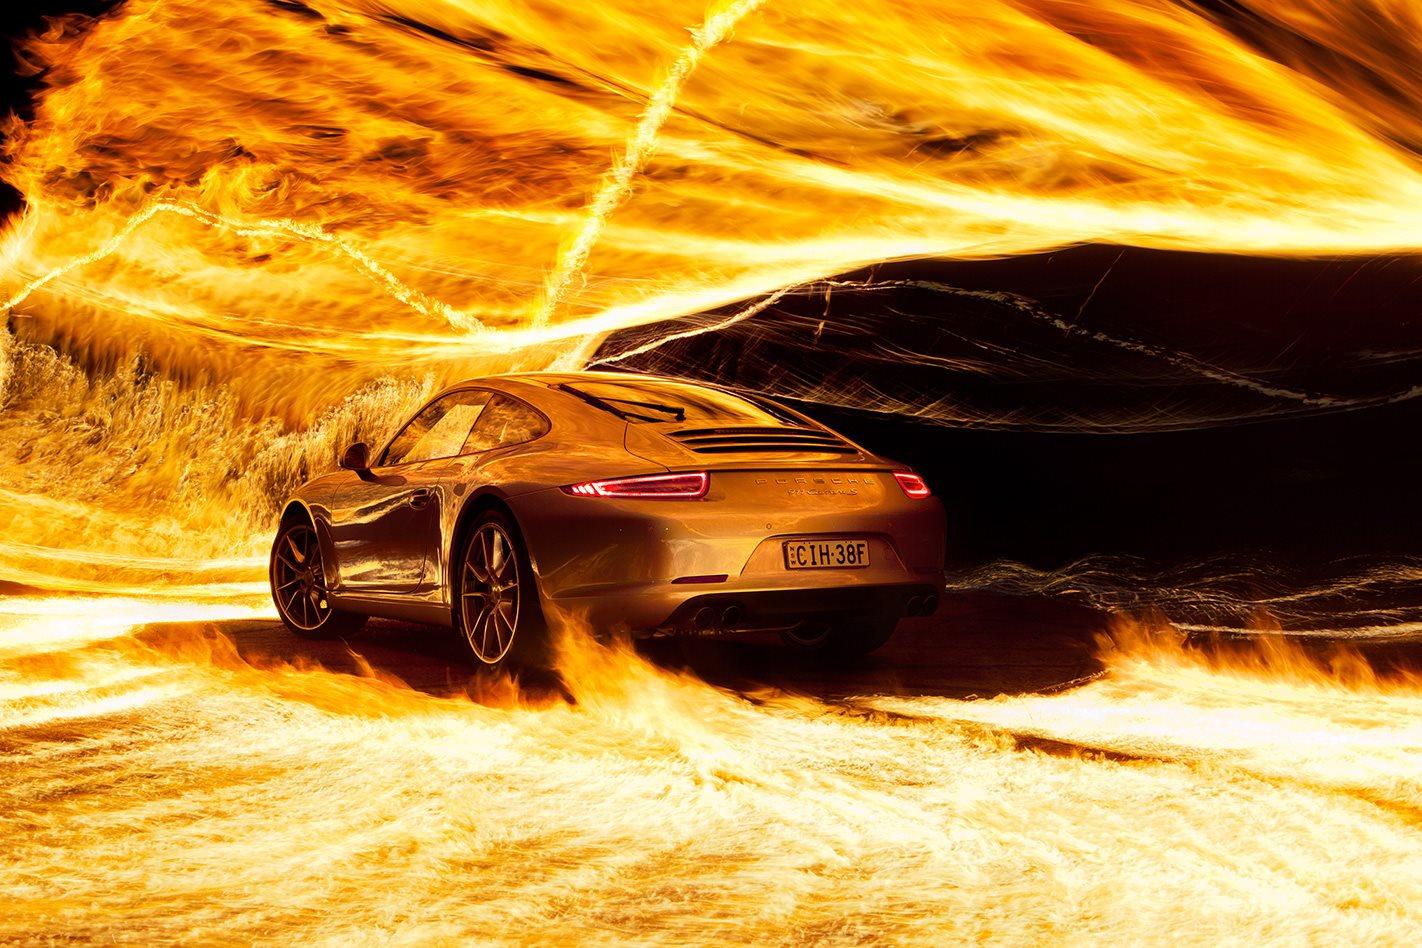 2012-Porsche-911-Carrera-S-exterior.jpg